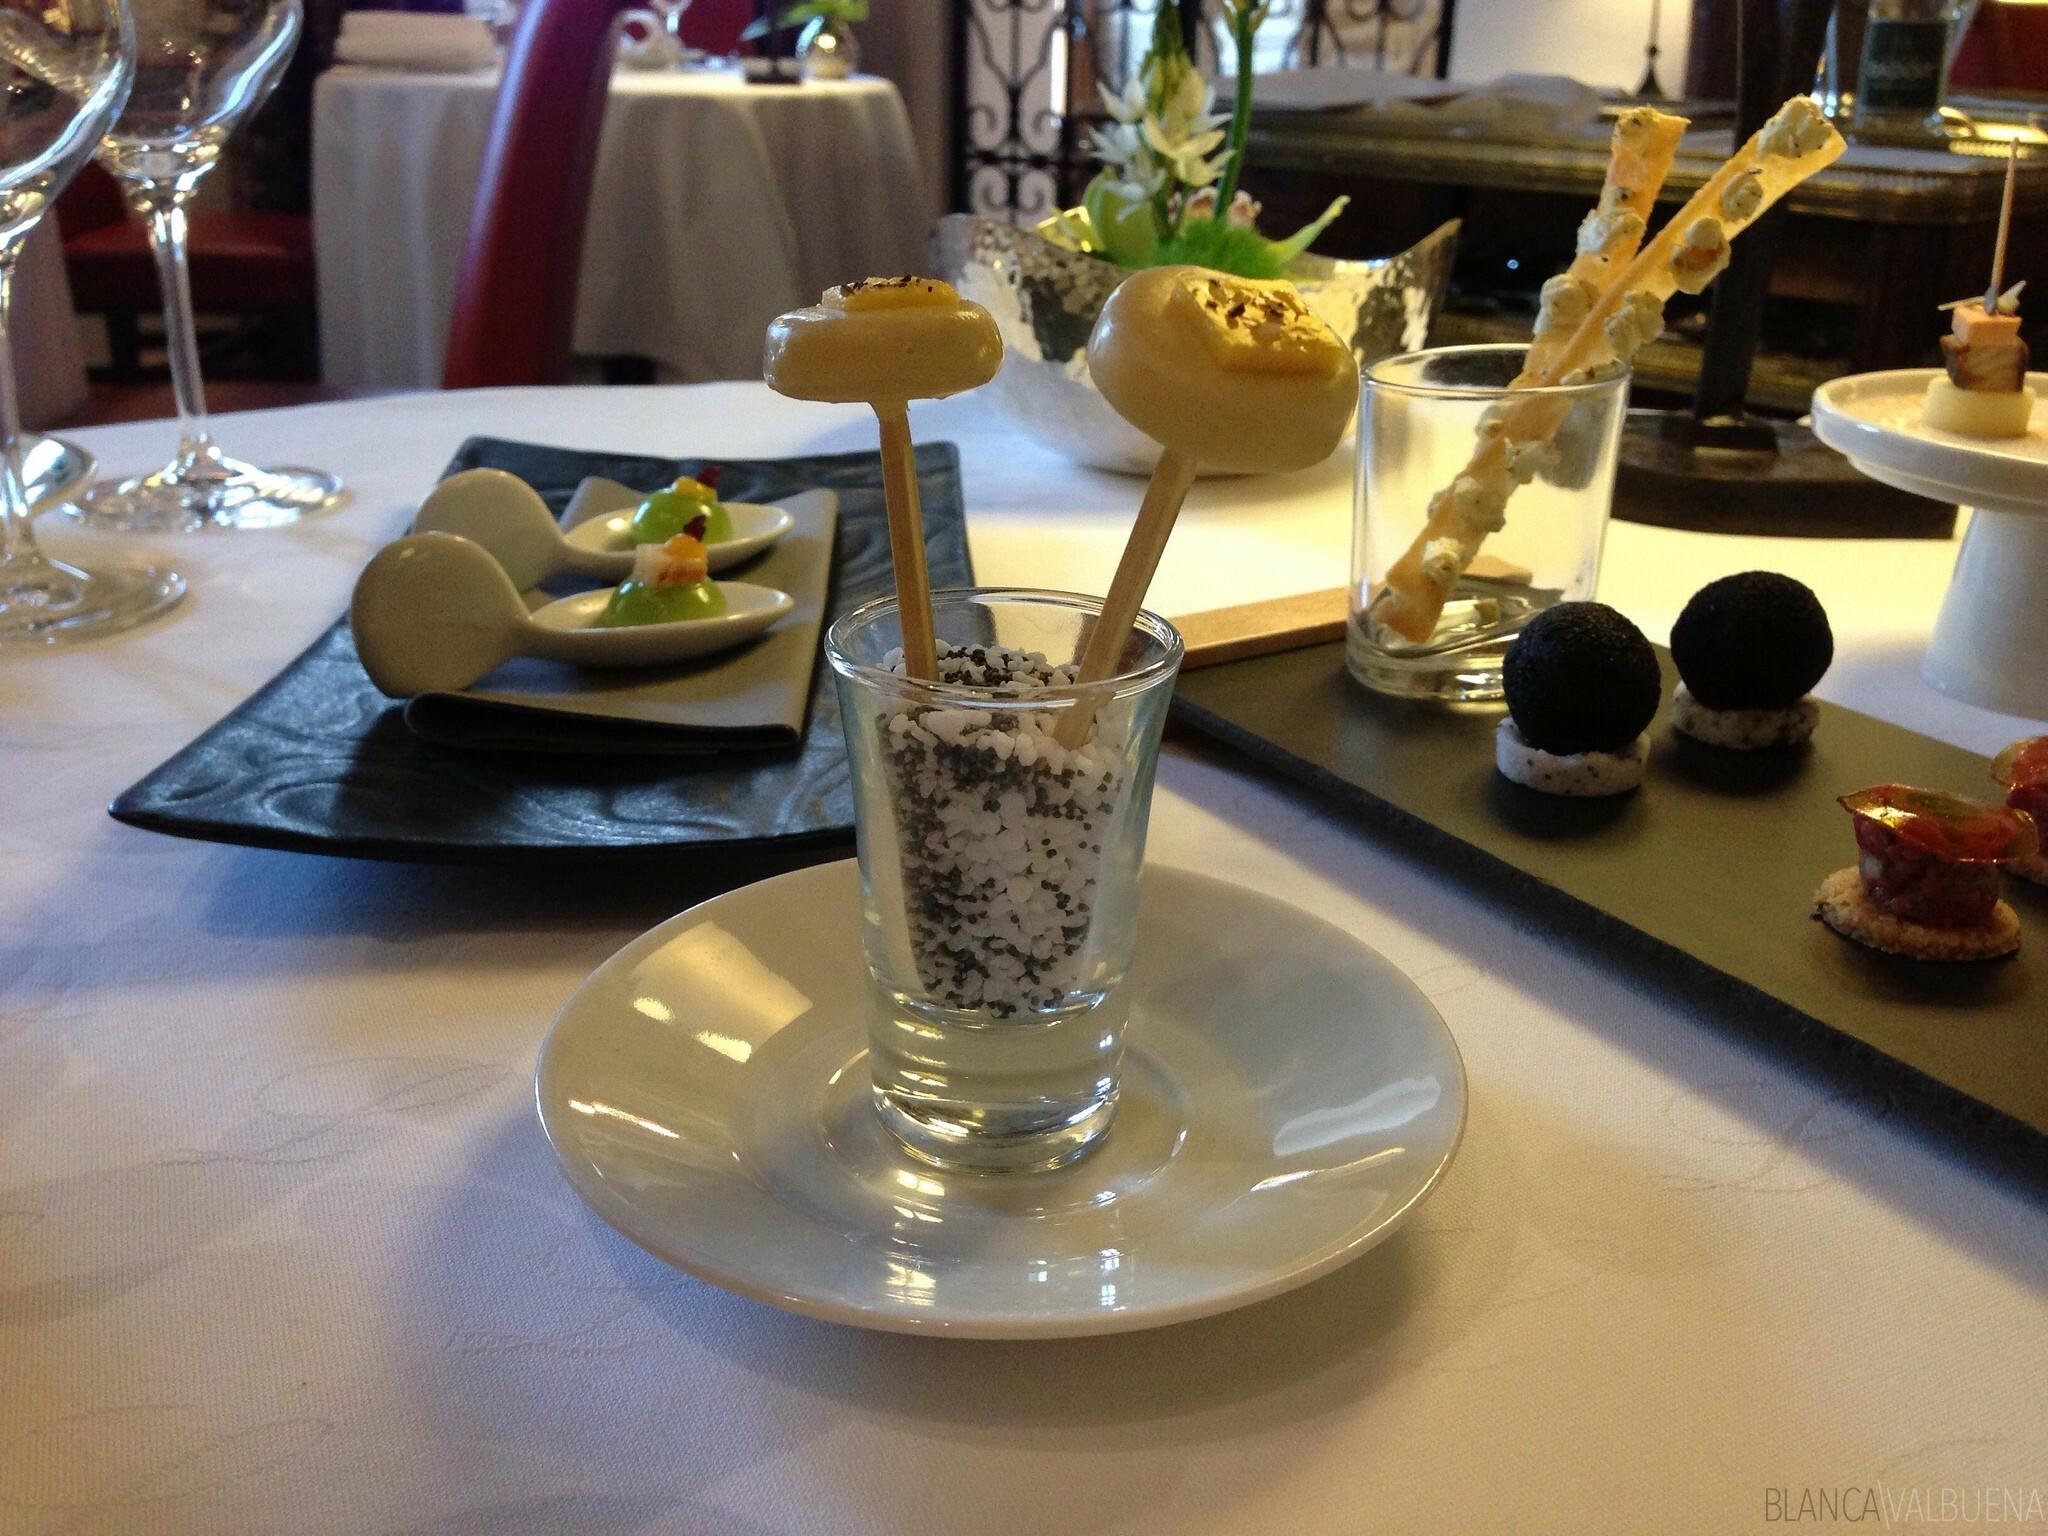 Maison Lameloise serves incredible food